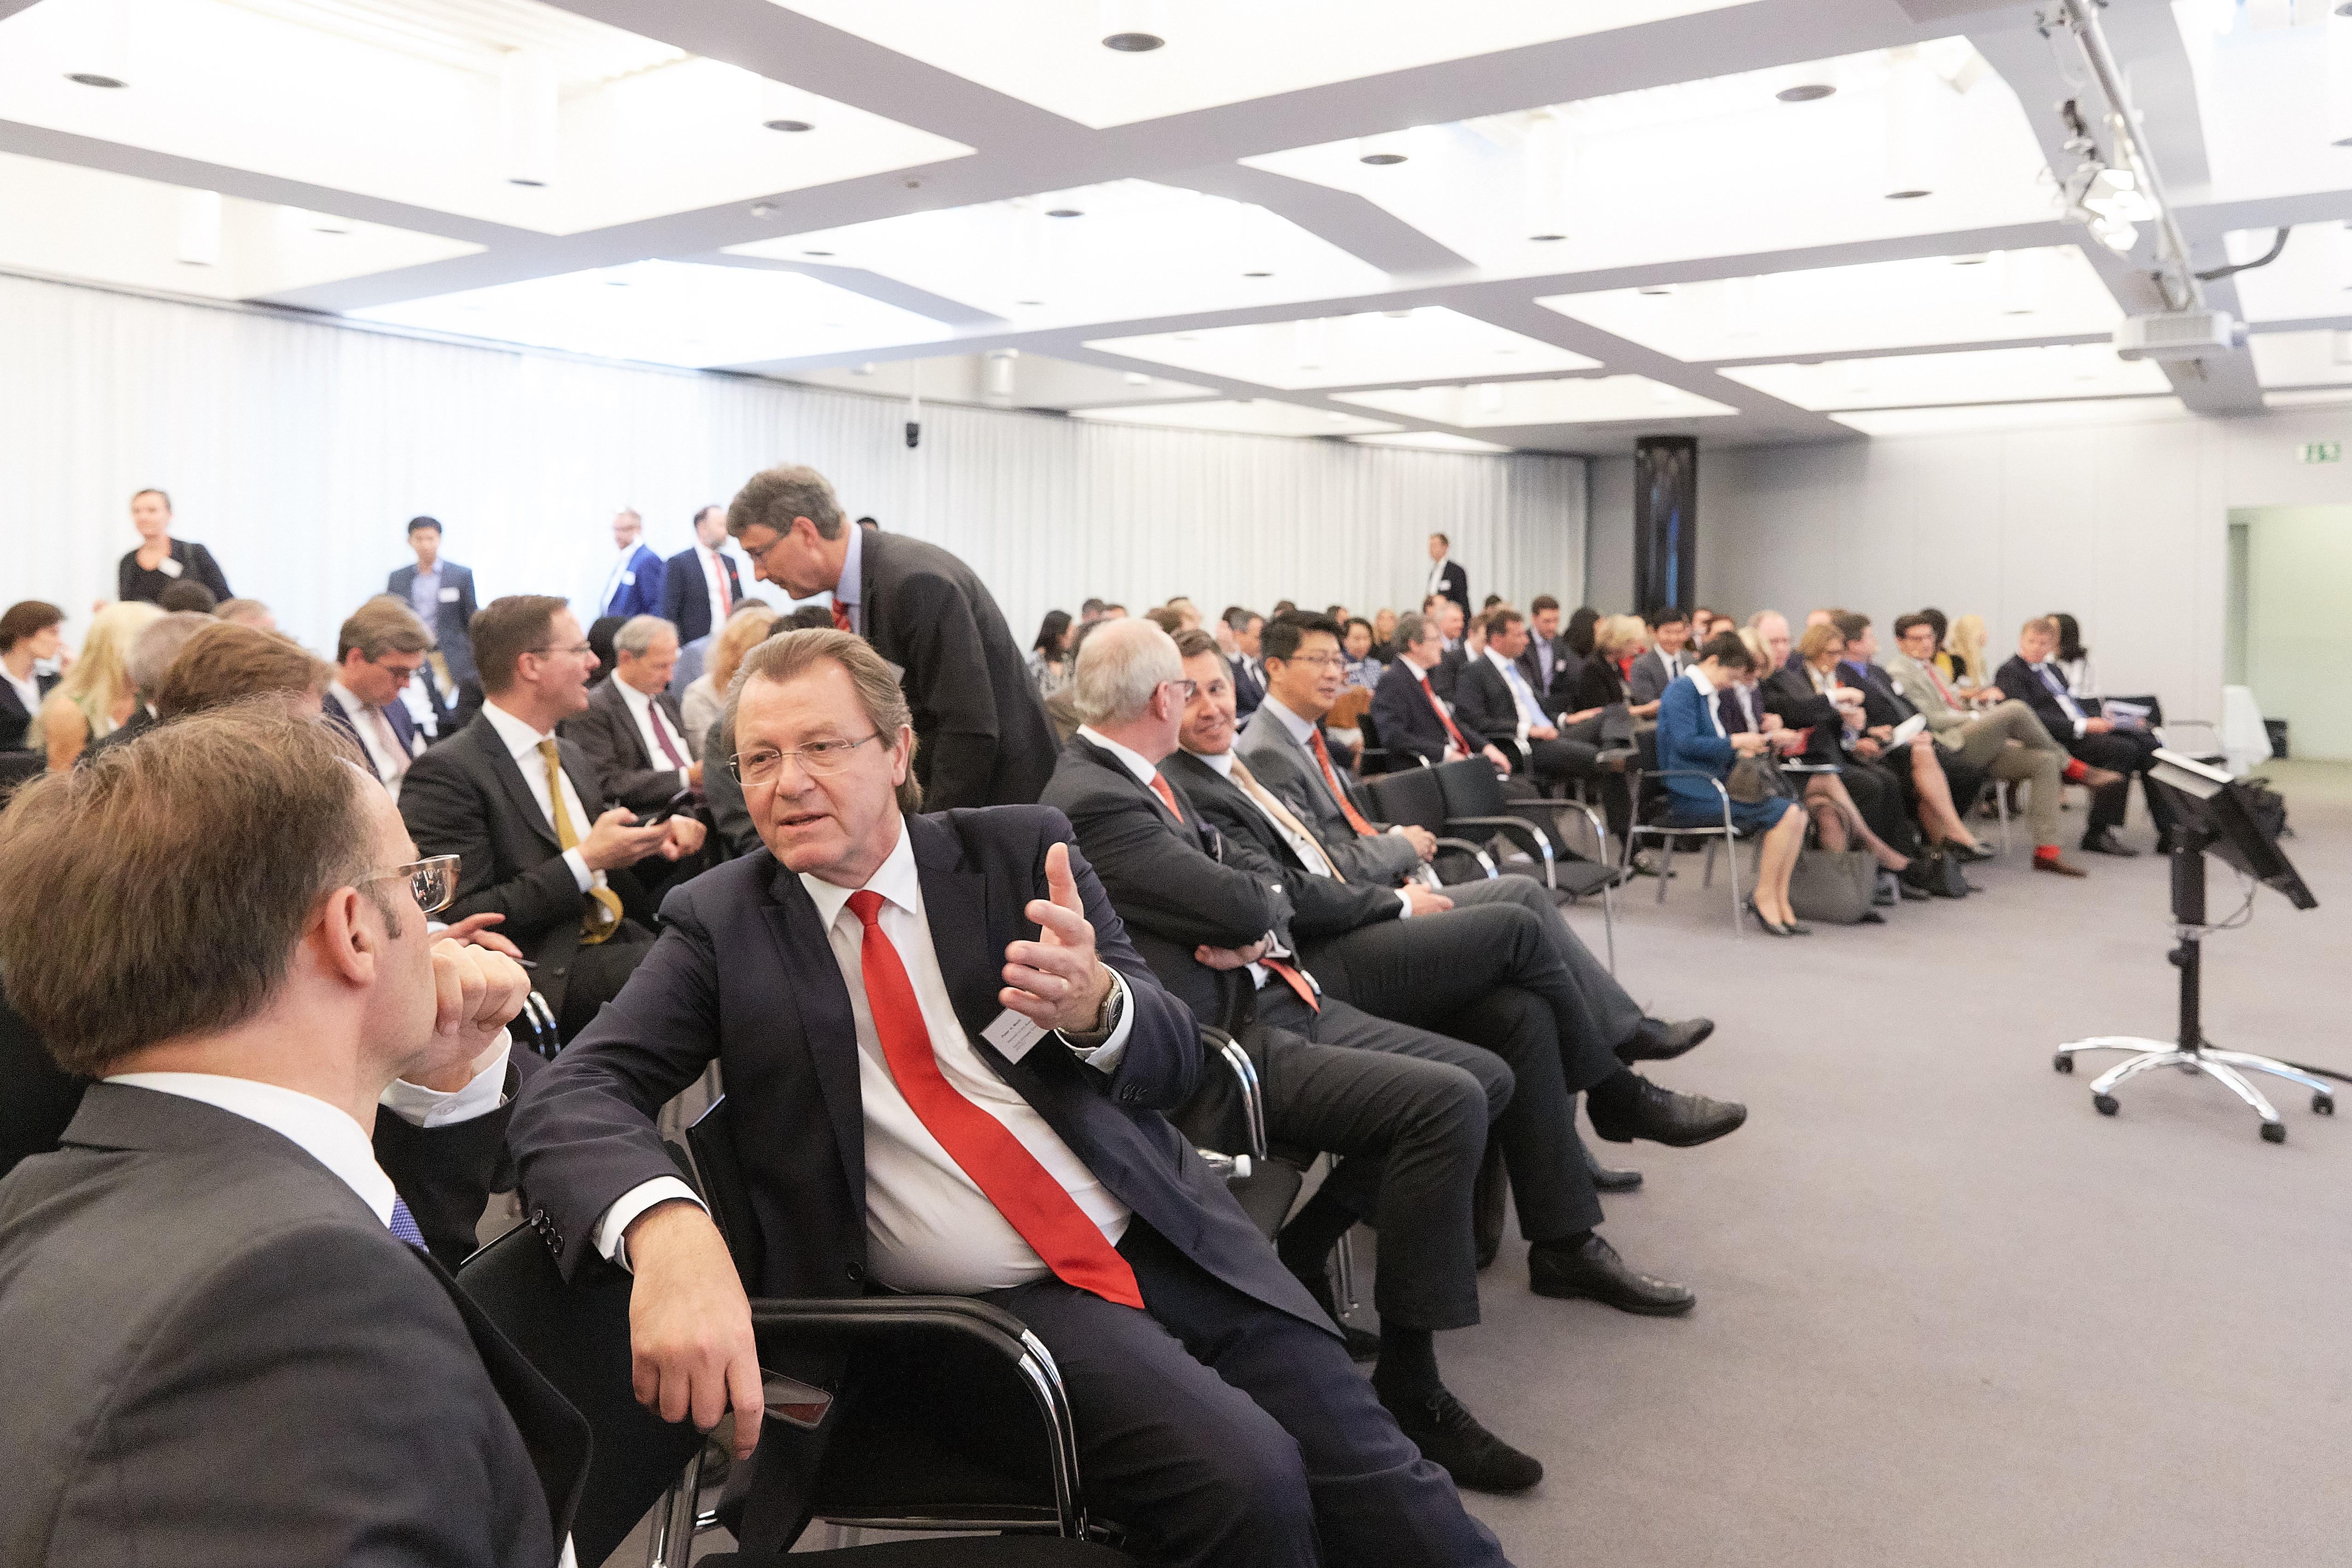 RMB Internationalization – Road to 2020